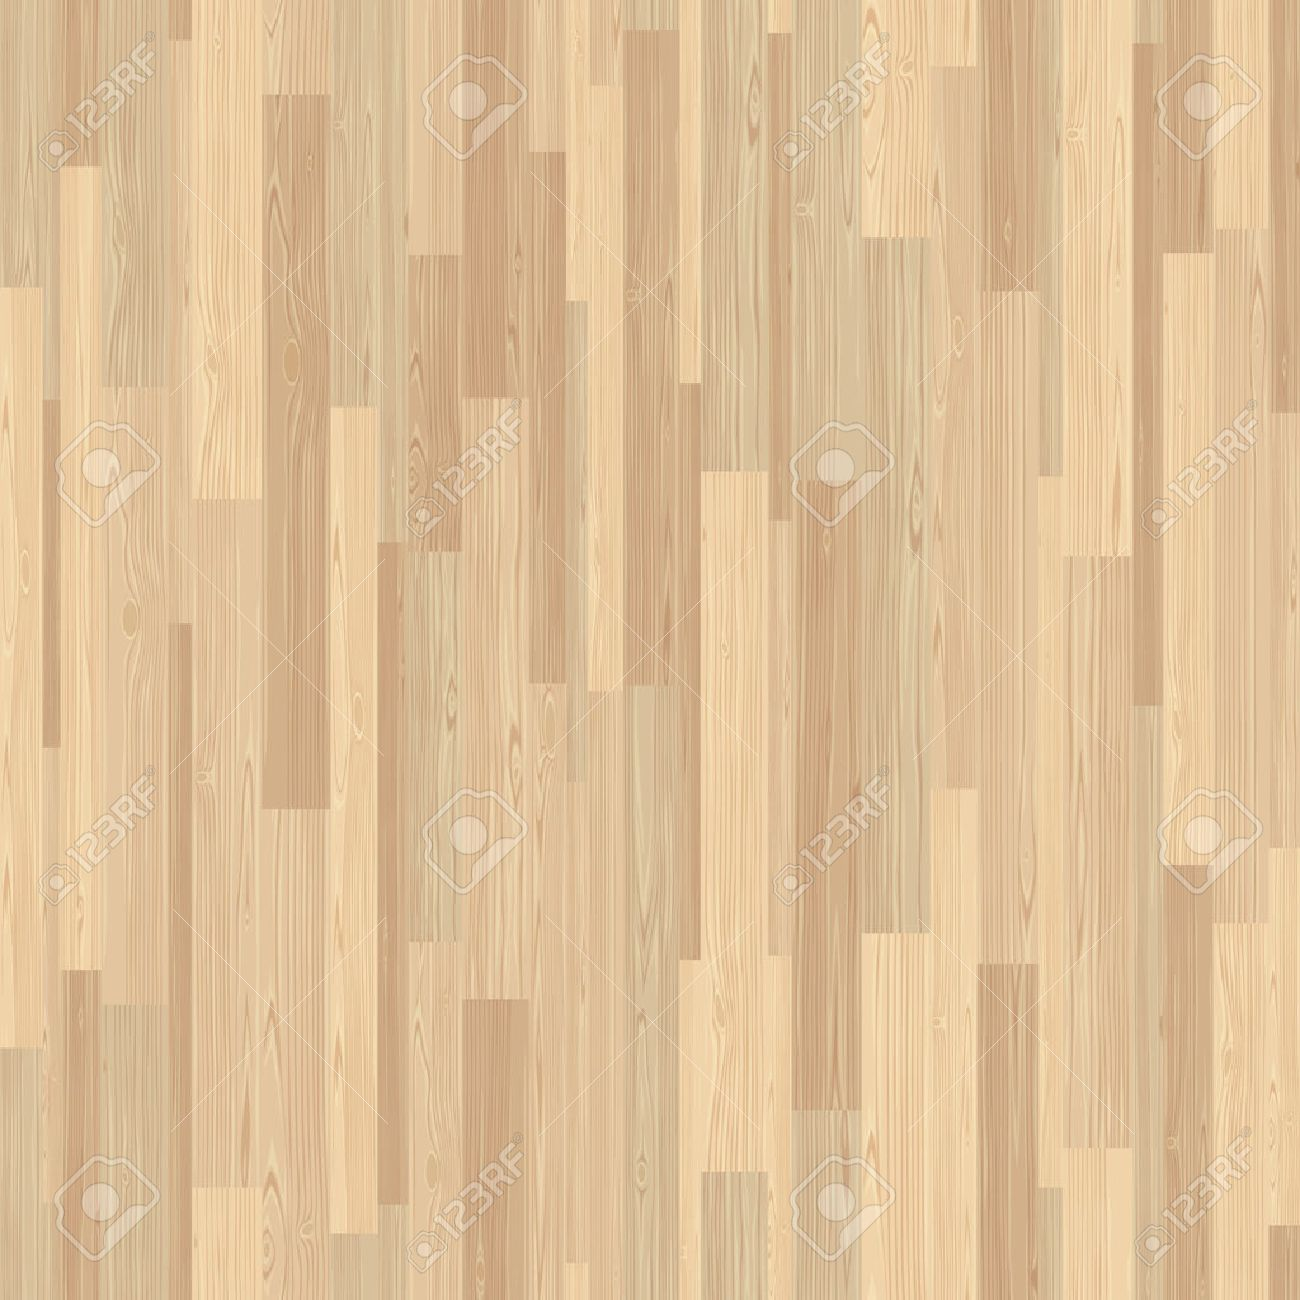 seamless light wood floor. Seamless Light Wood Floor Texture Wooden Flooring X